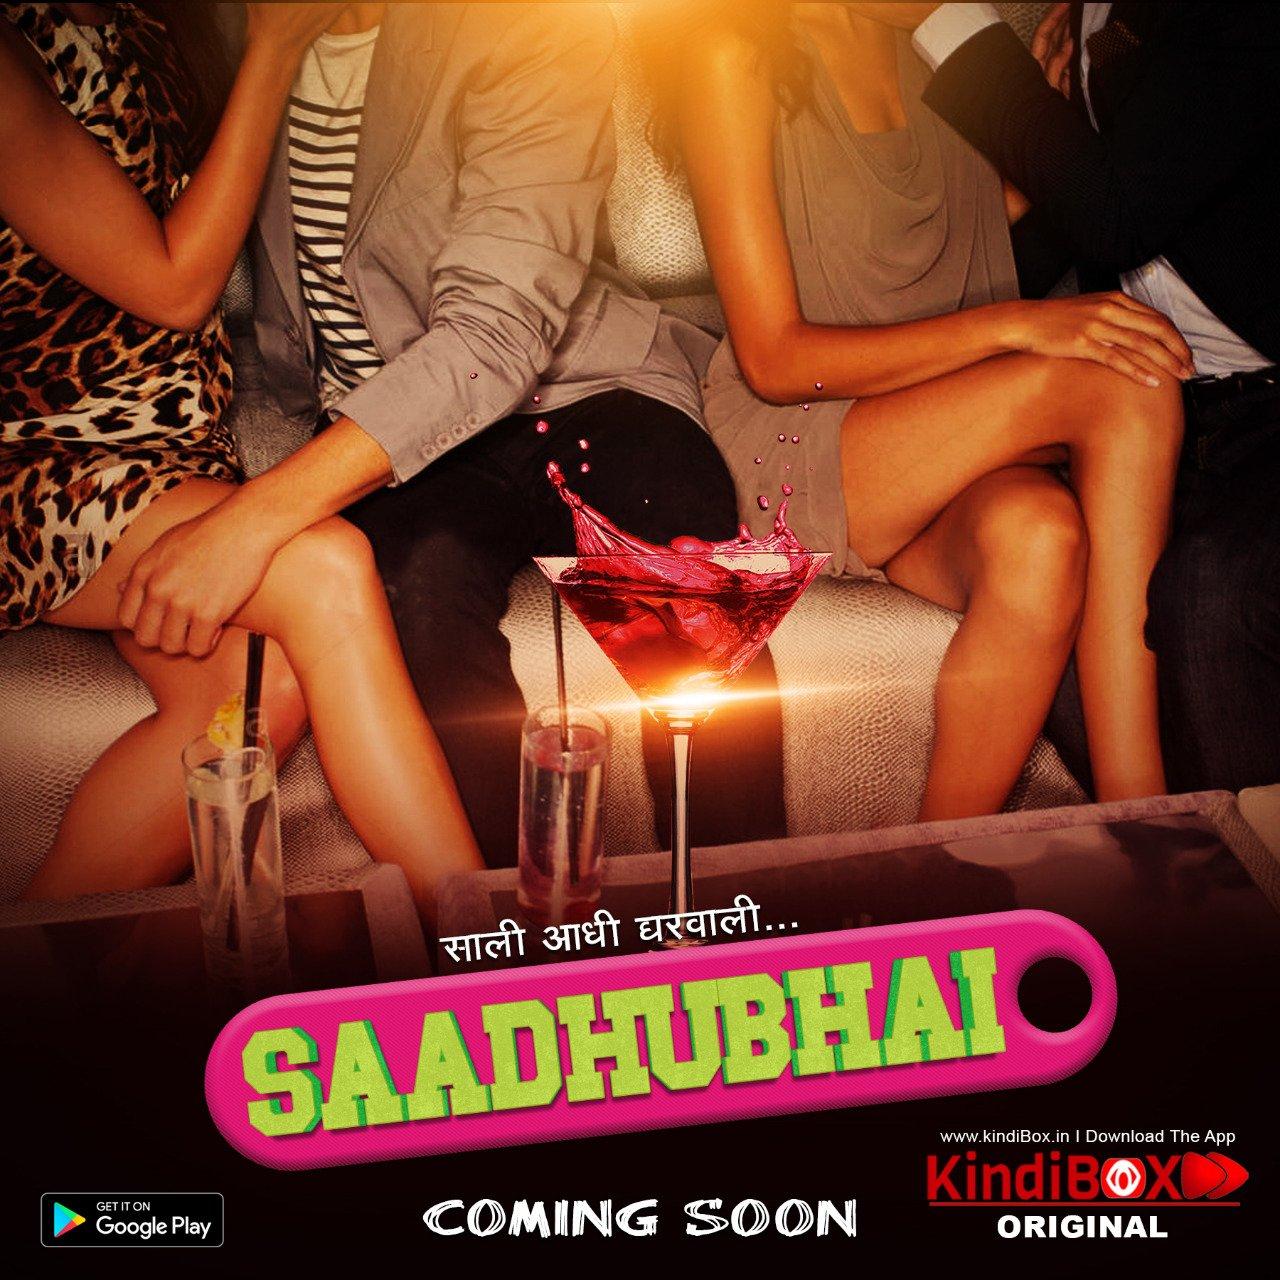 Saadhubhai 2020 Hindi S01E02 Kindibox Web Series 720p HDRip 150MB Download